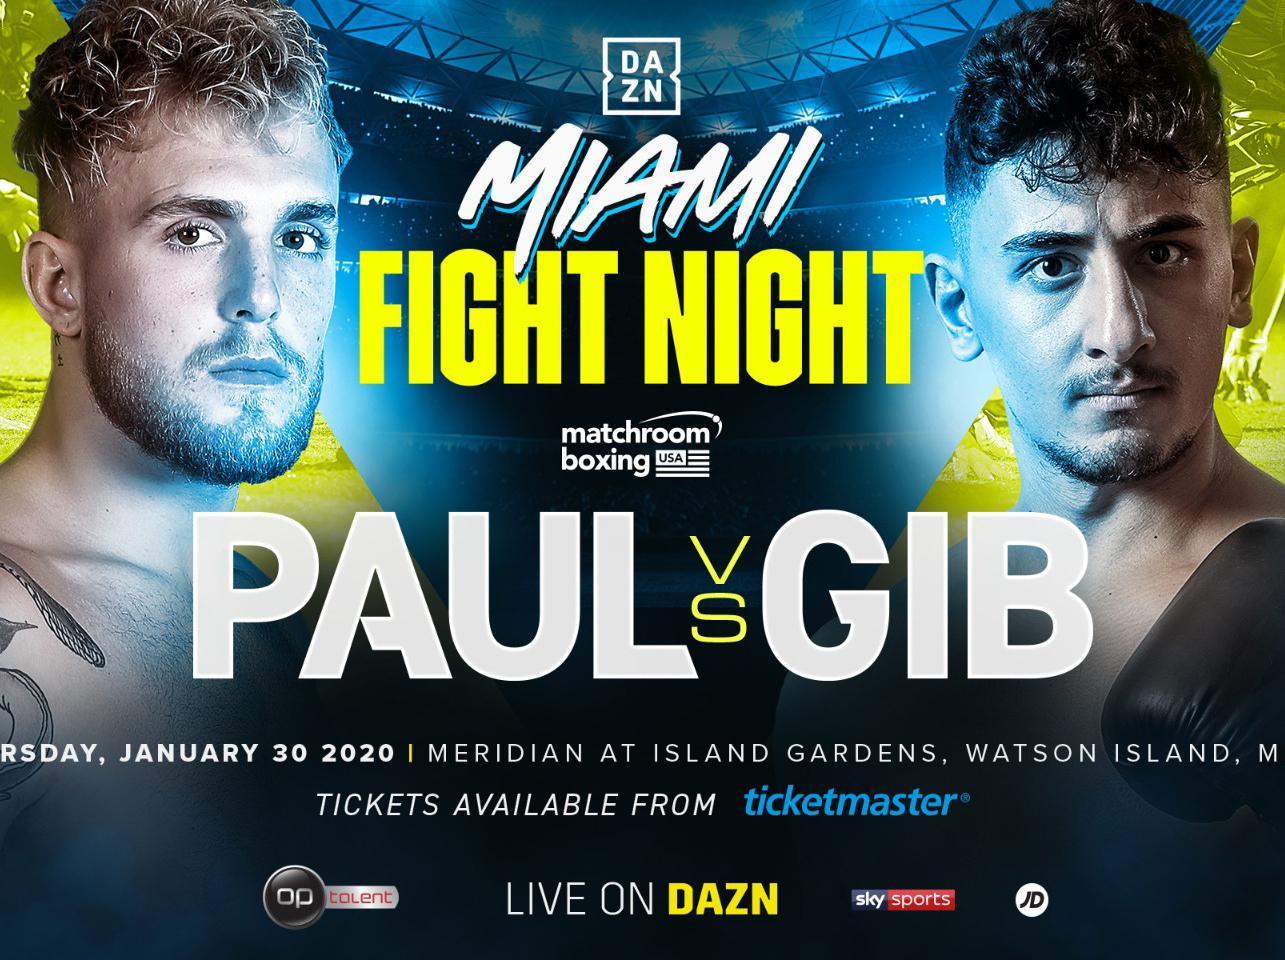 Jake Paul vs Gib: YouTube fight confirmed by Matchroom ...